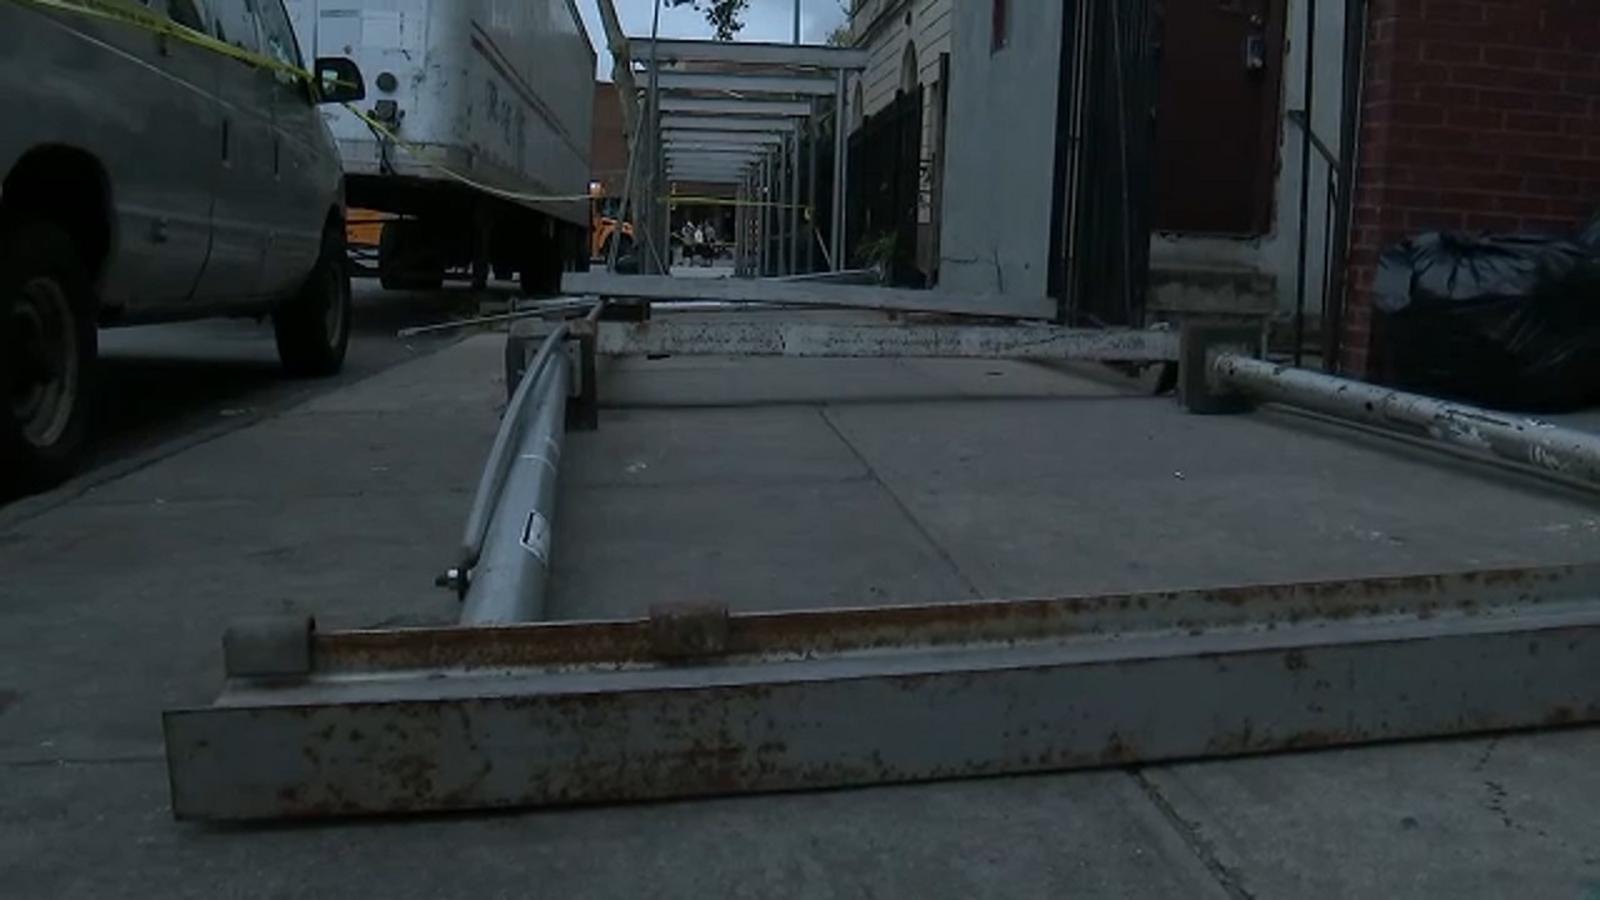 2 injured in sidewalk shed collapse outside Yeshiva in Brooklyn